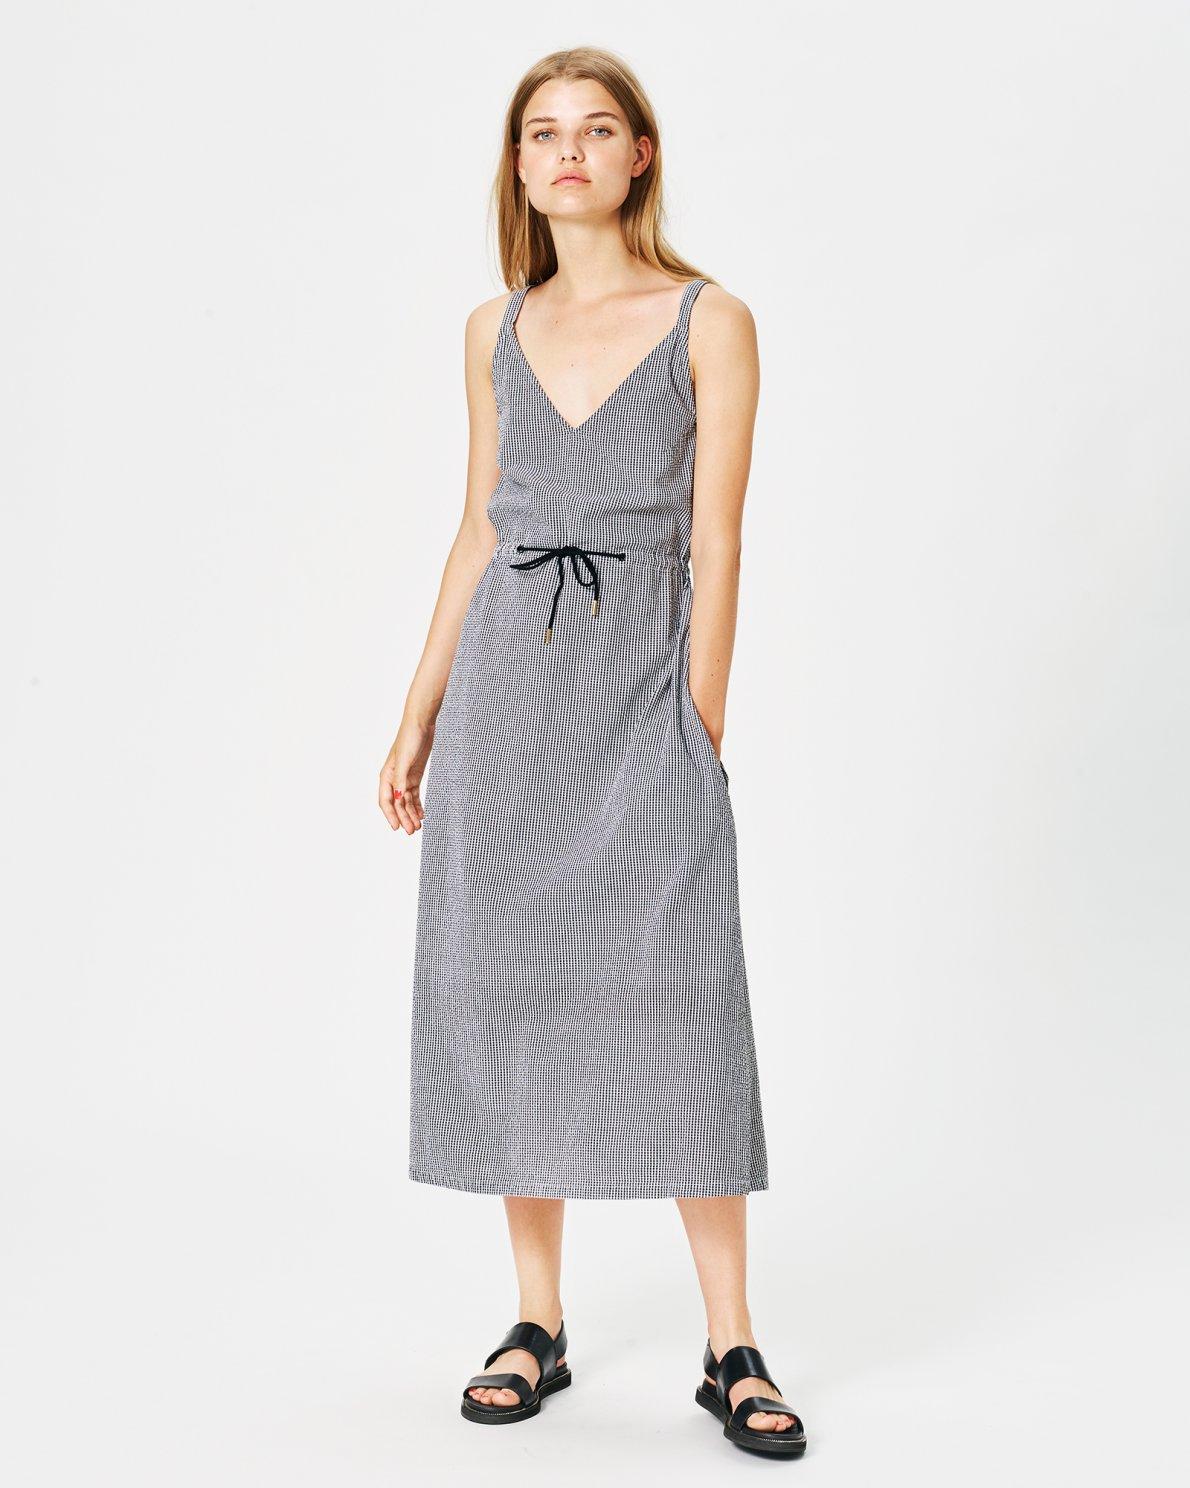 c4668f15c6e7 OUTLET Clothing - Moss Copenhagen - Lena Dress